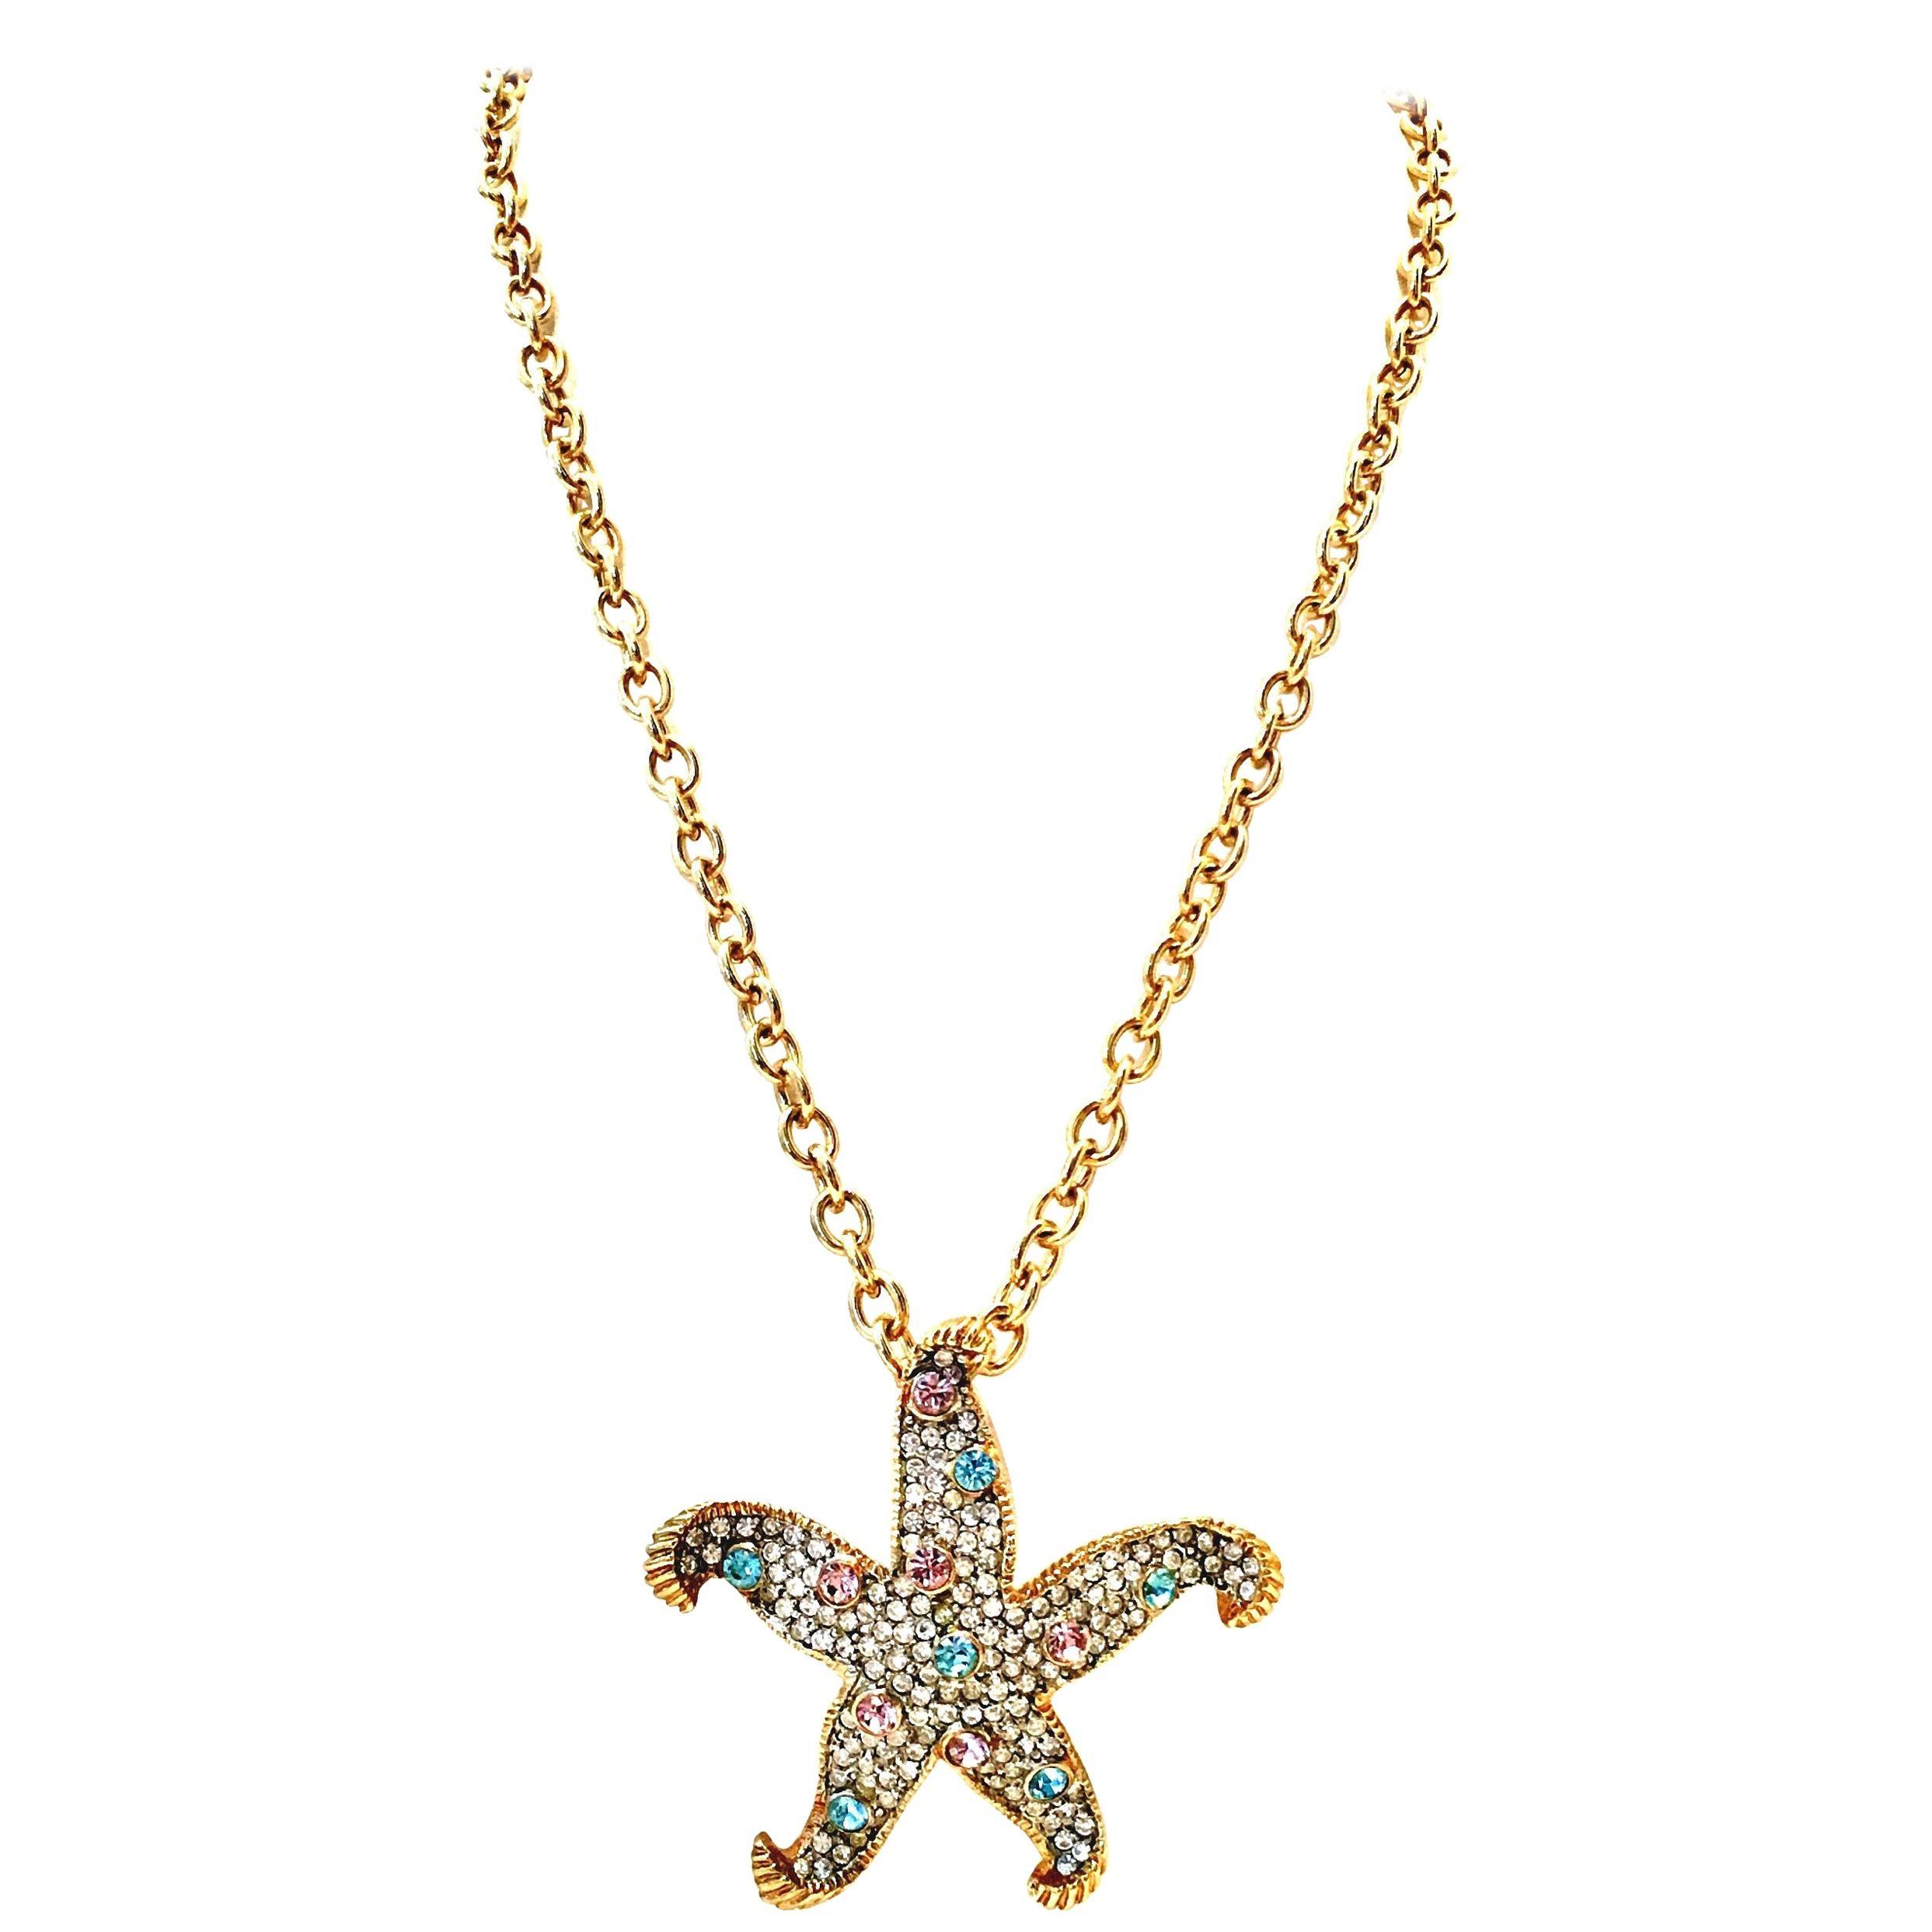 d08d8f1218b46 21st Century Gold & Swarovski Crystal Starfish Pendant Necklace By, K. Lane